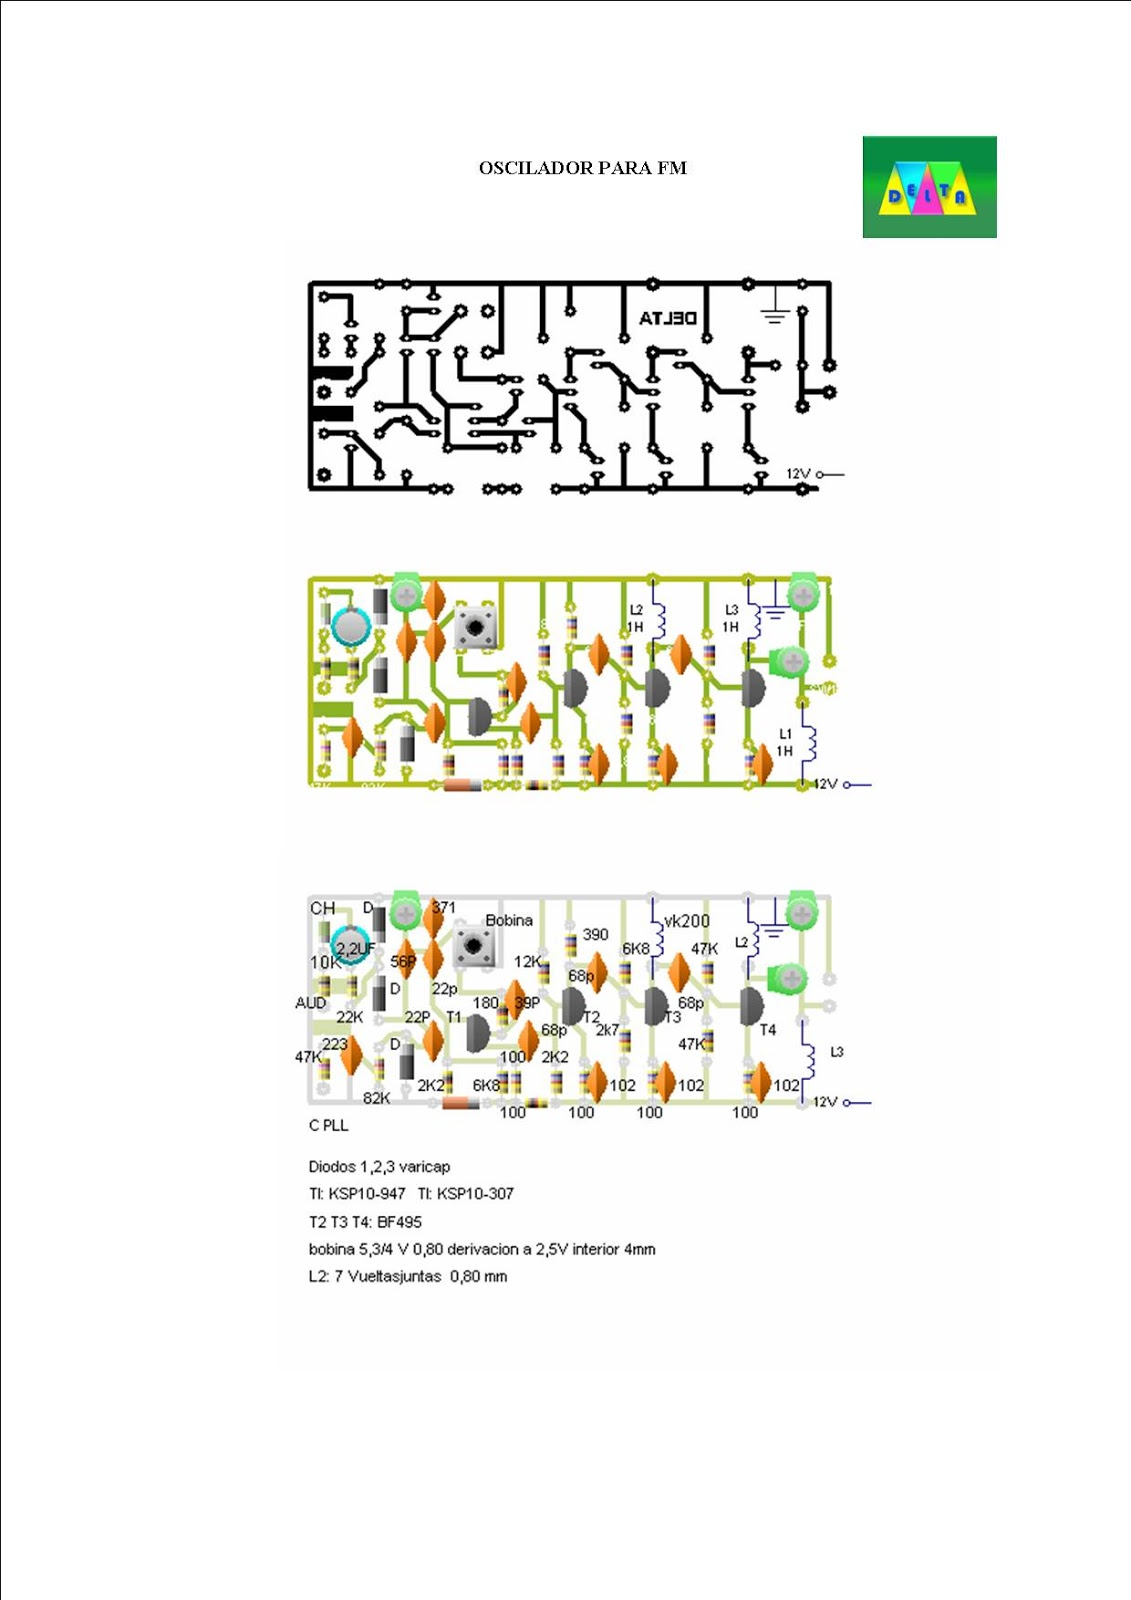 Circuito Oscilador : Oscilador para transmisor de fm comercial bandas de a mhz